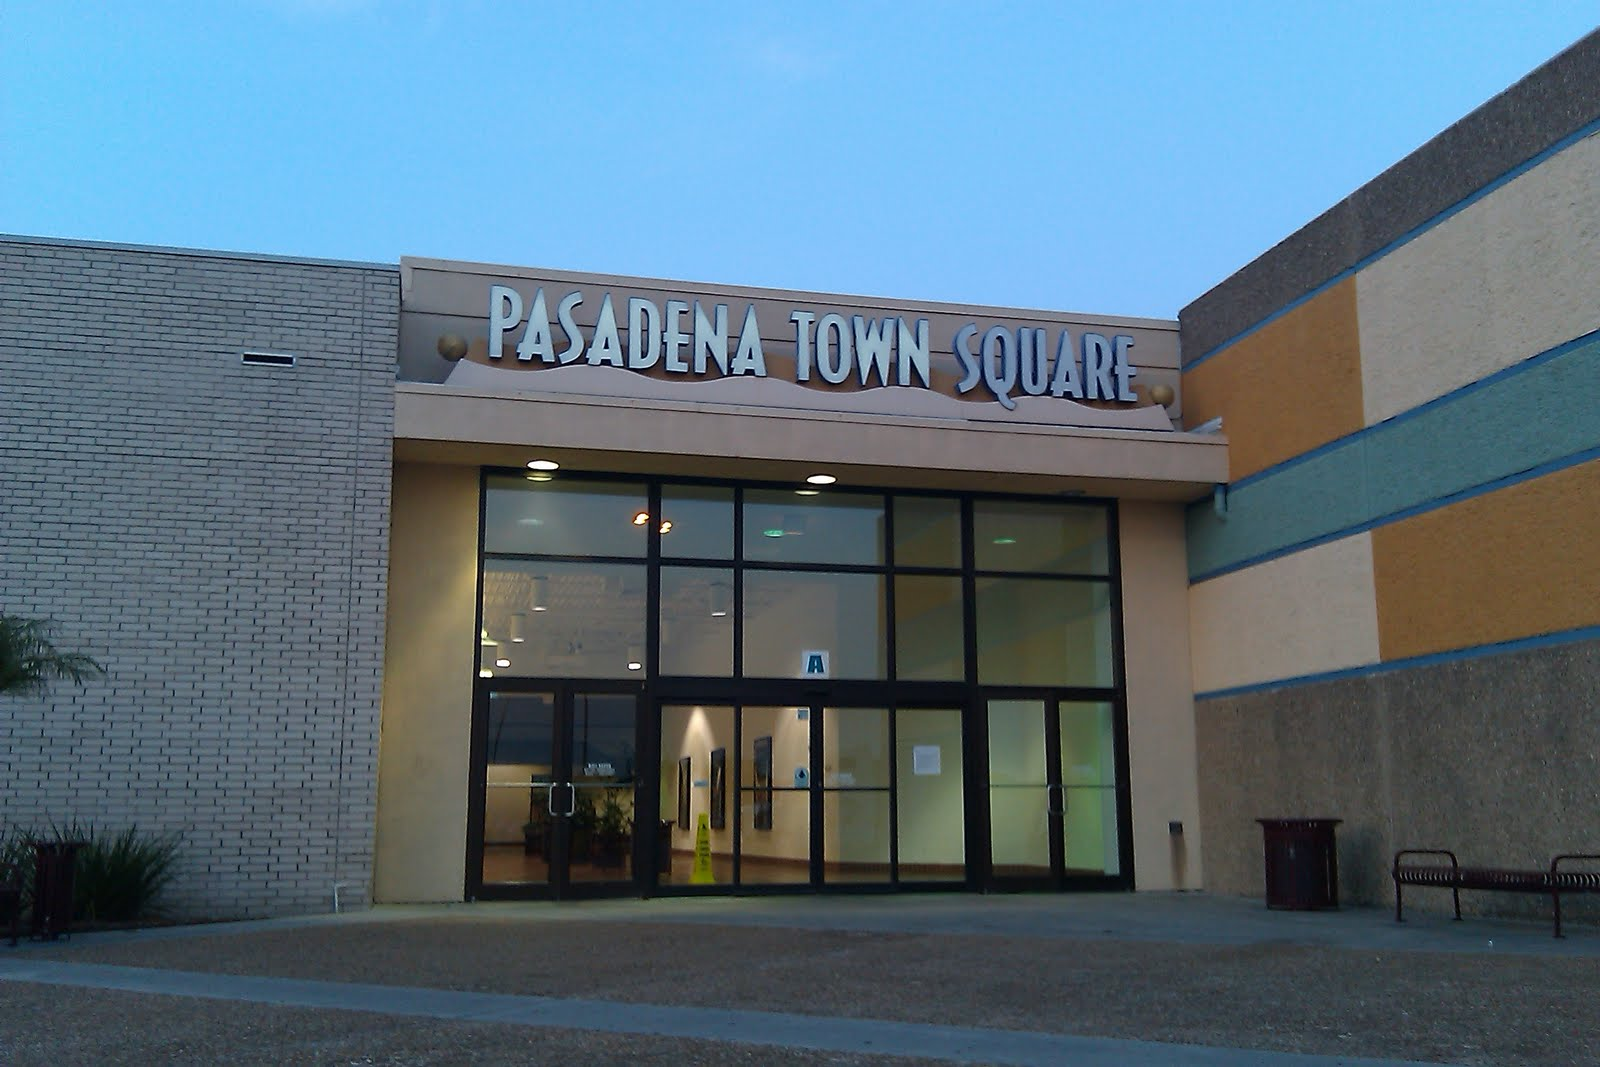 The Louisiana And Texas Retail Blogspot Pasadena Town Square And